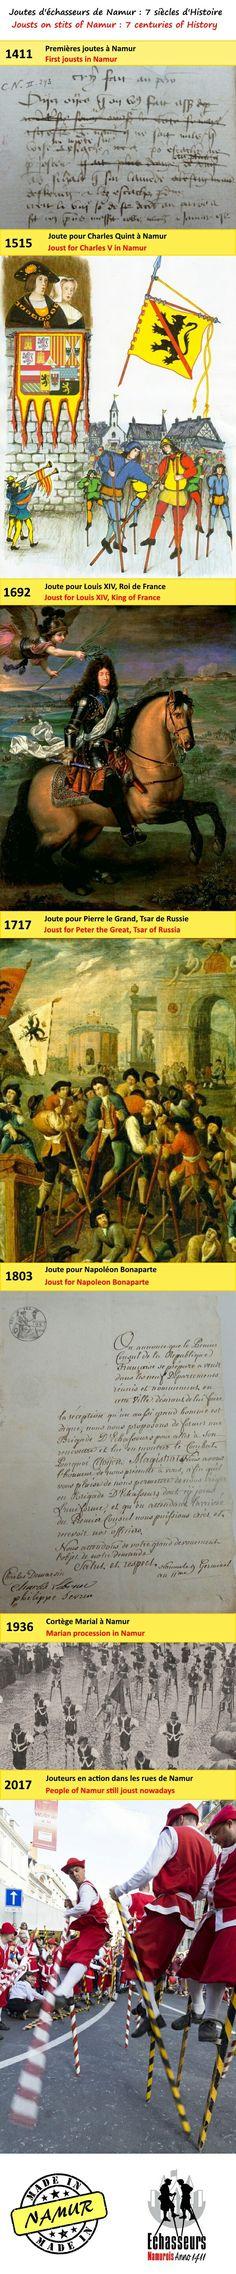 Les échasseurs namurois, combat d'échassiers Old Things, World, Photos, Folklore, Belgium, Pictures, The World, Earth